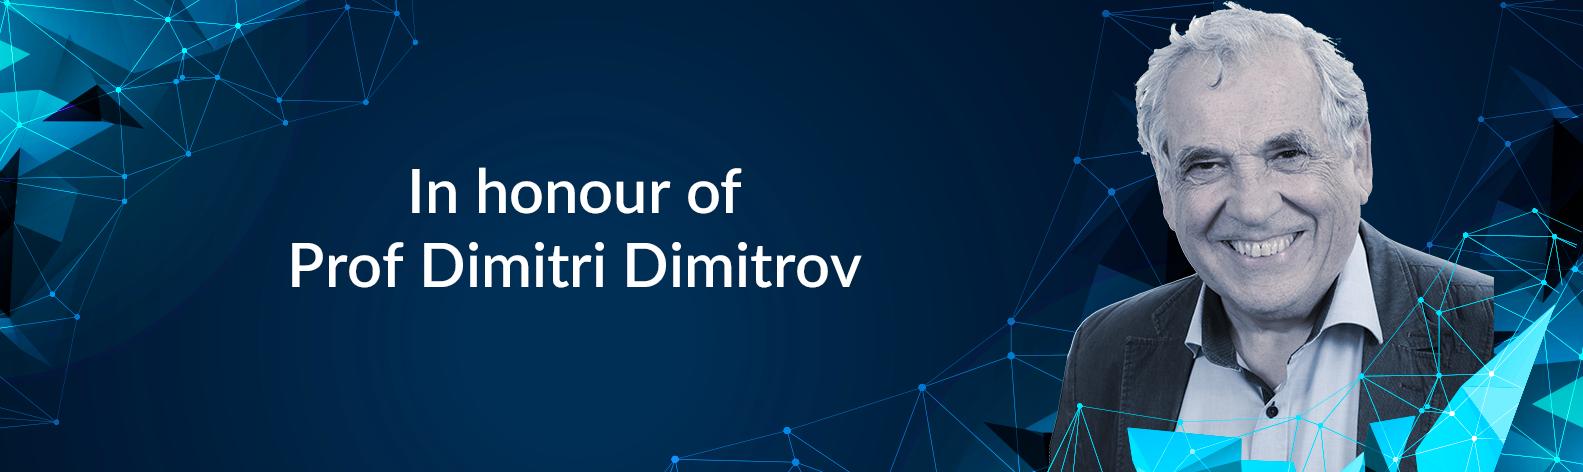 In honor of Prof Dimmitri Dimitrov